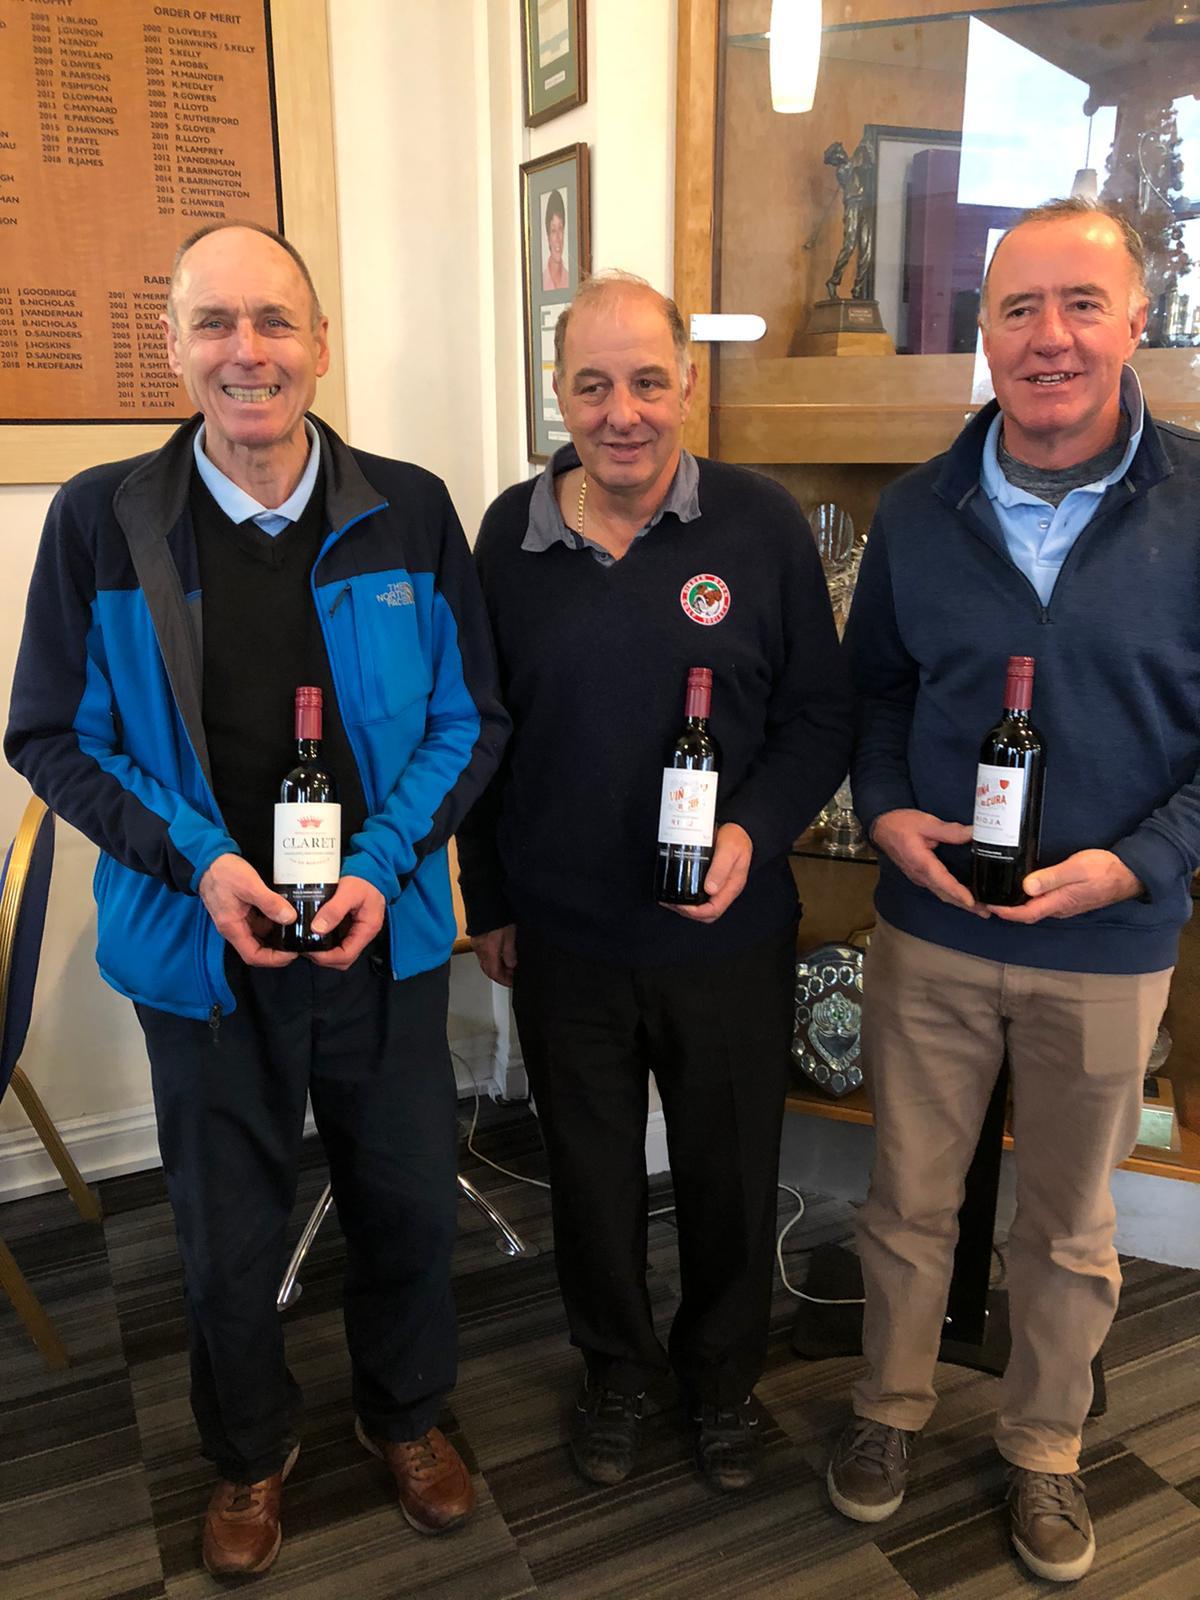 10 December Wine Winners: L to R:- P Wastell - C Viney - D McManus